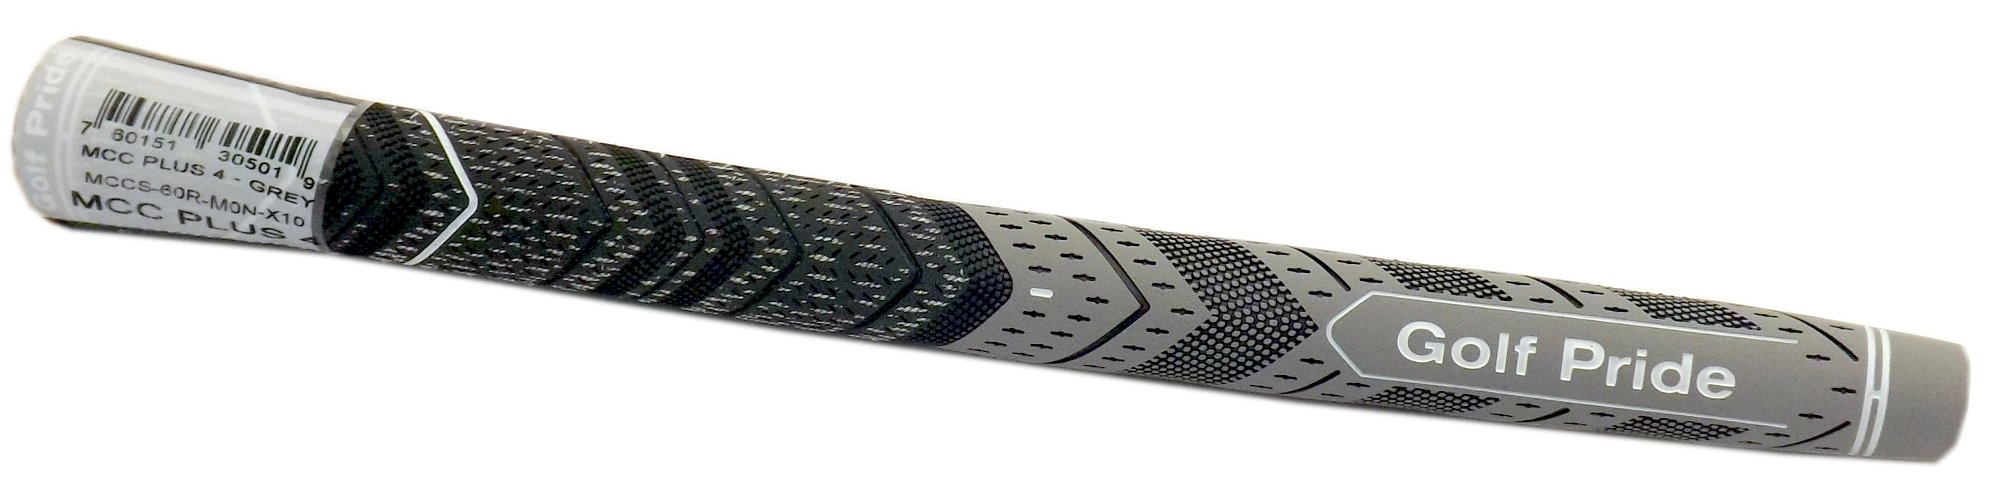 13 NEW Golf Pride New Decade Multi Compound MCC PLUS4 Grips Grey Standard